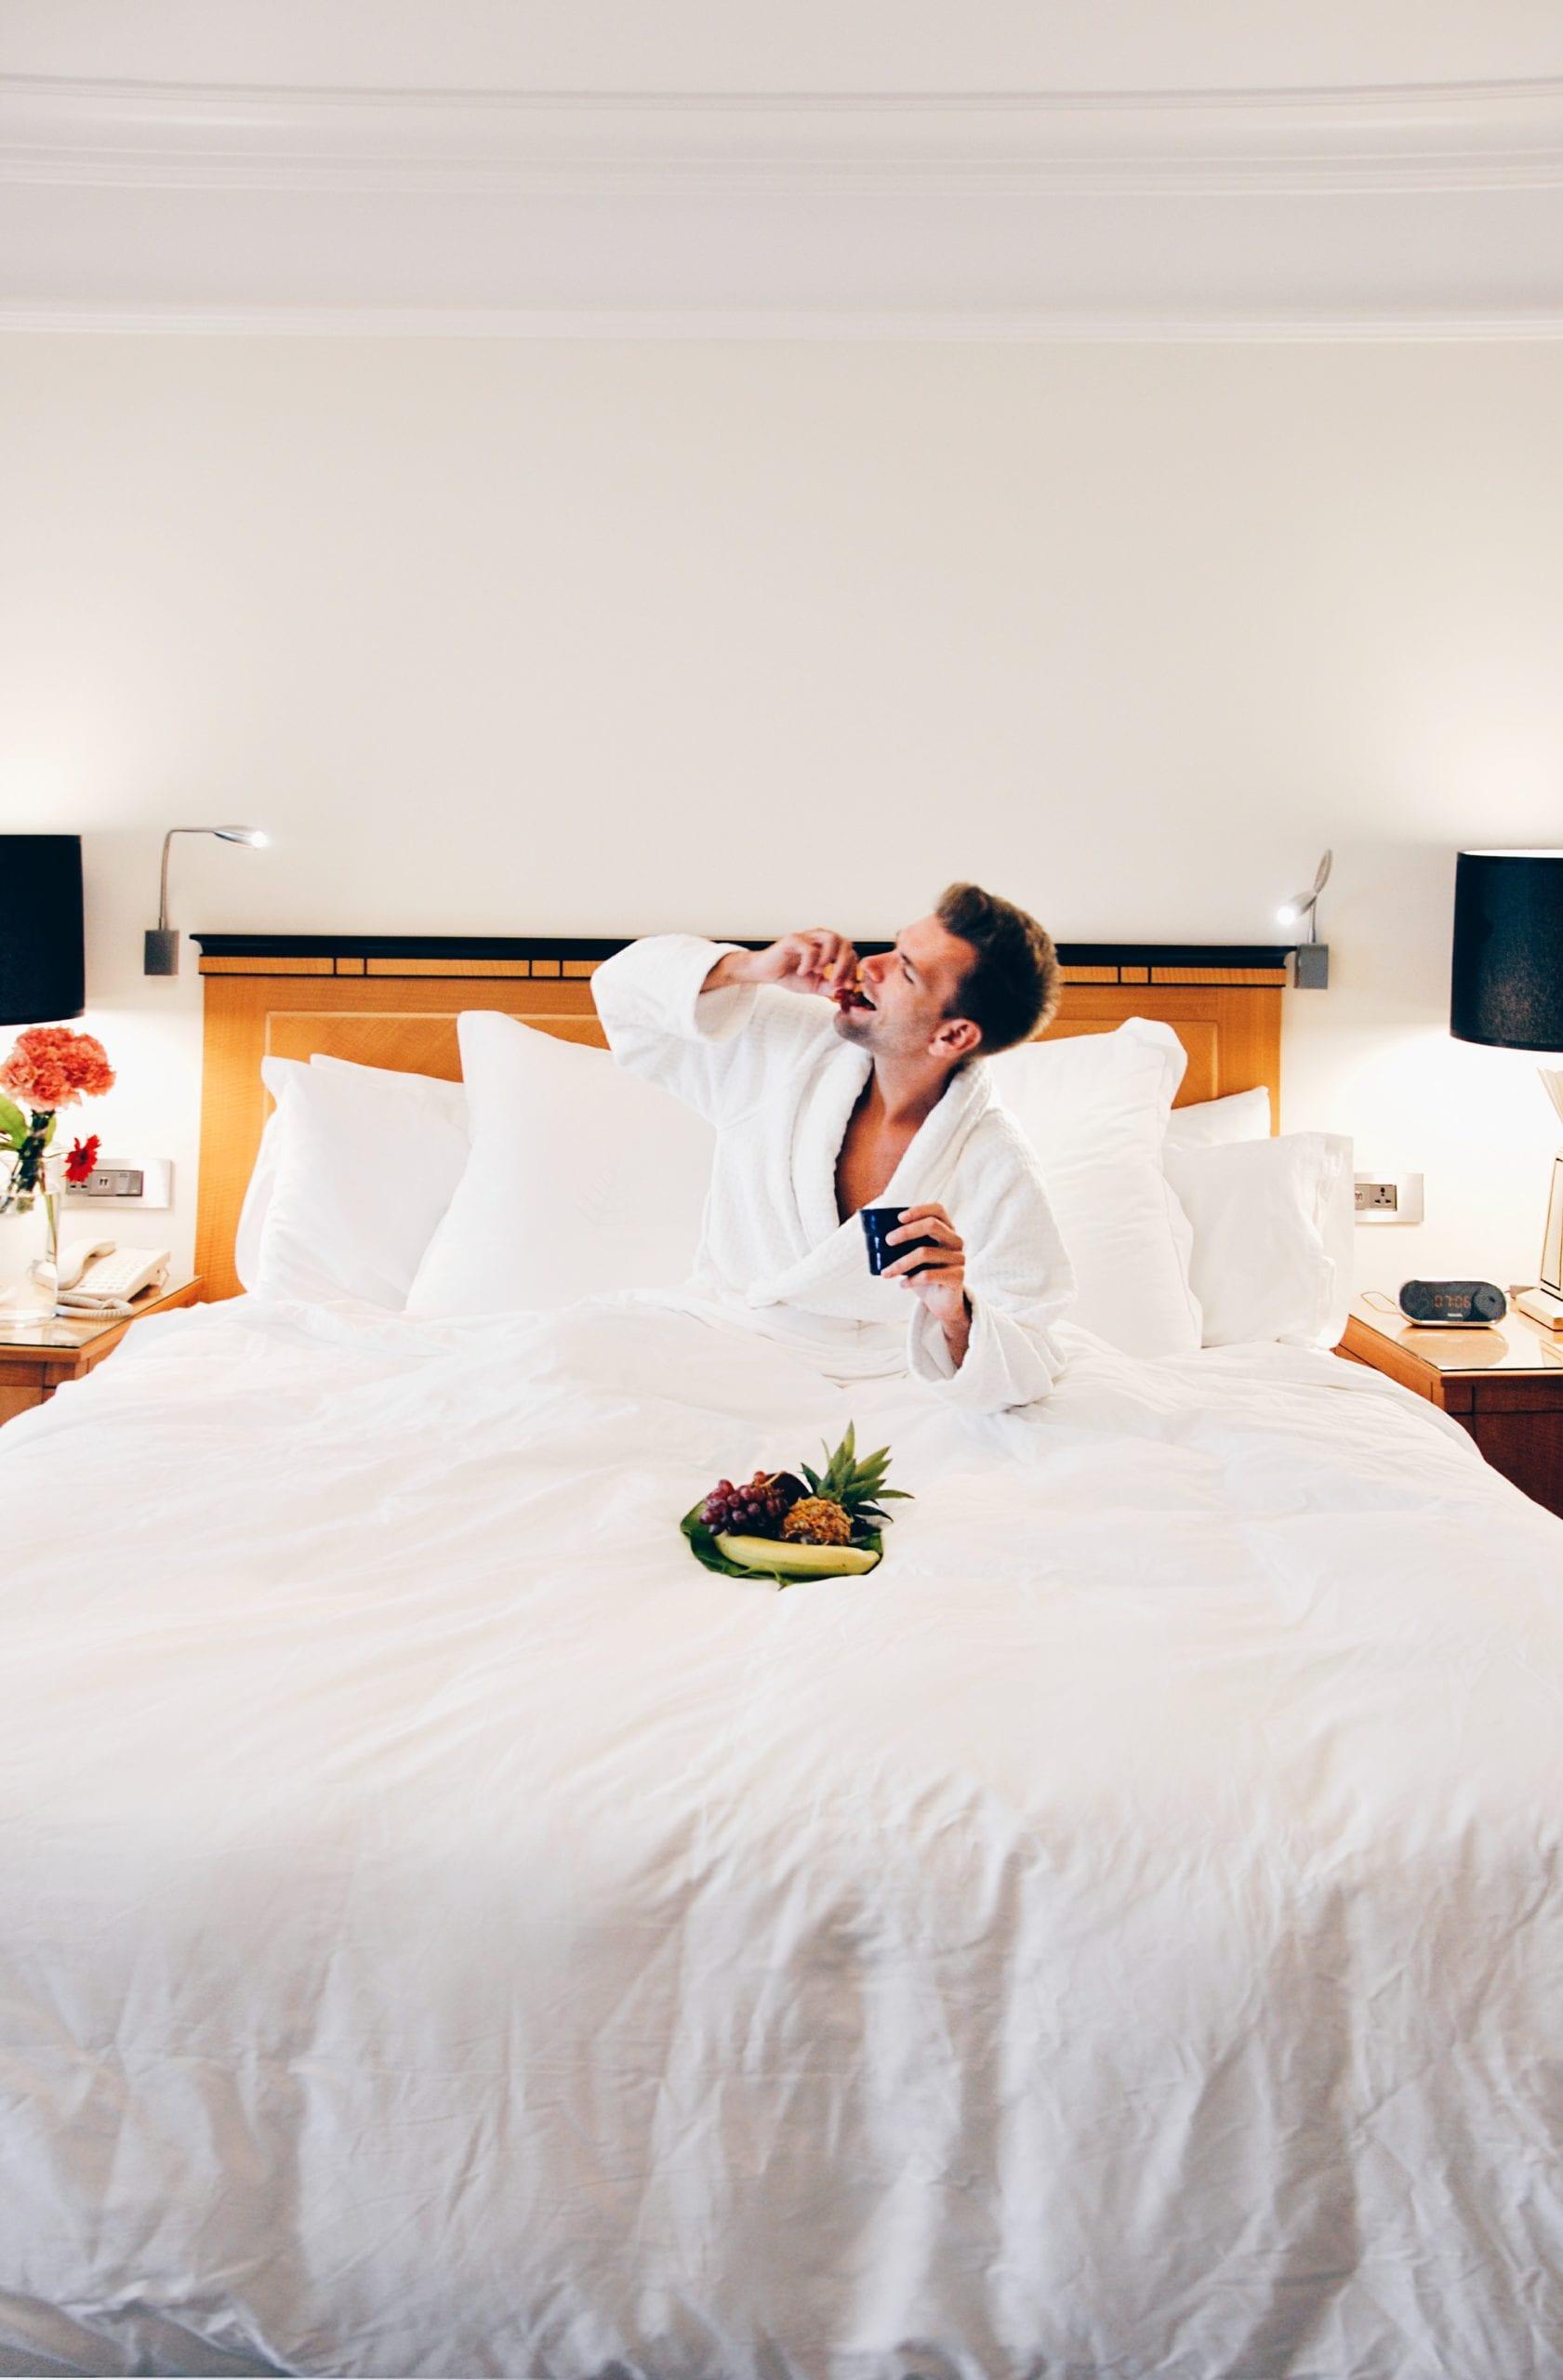 rest-easy hotels near JPJ